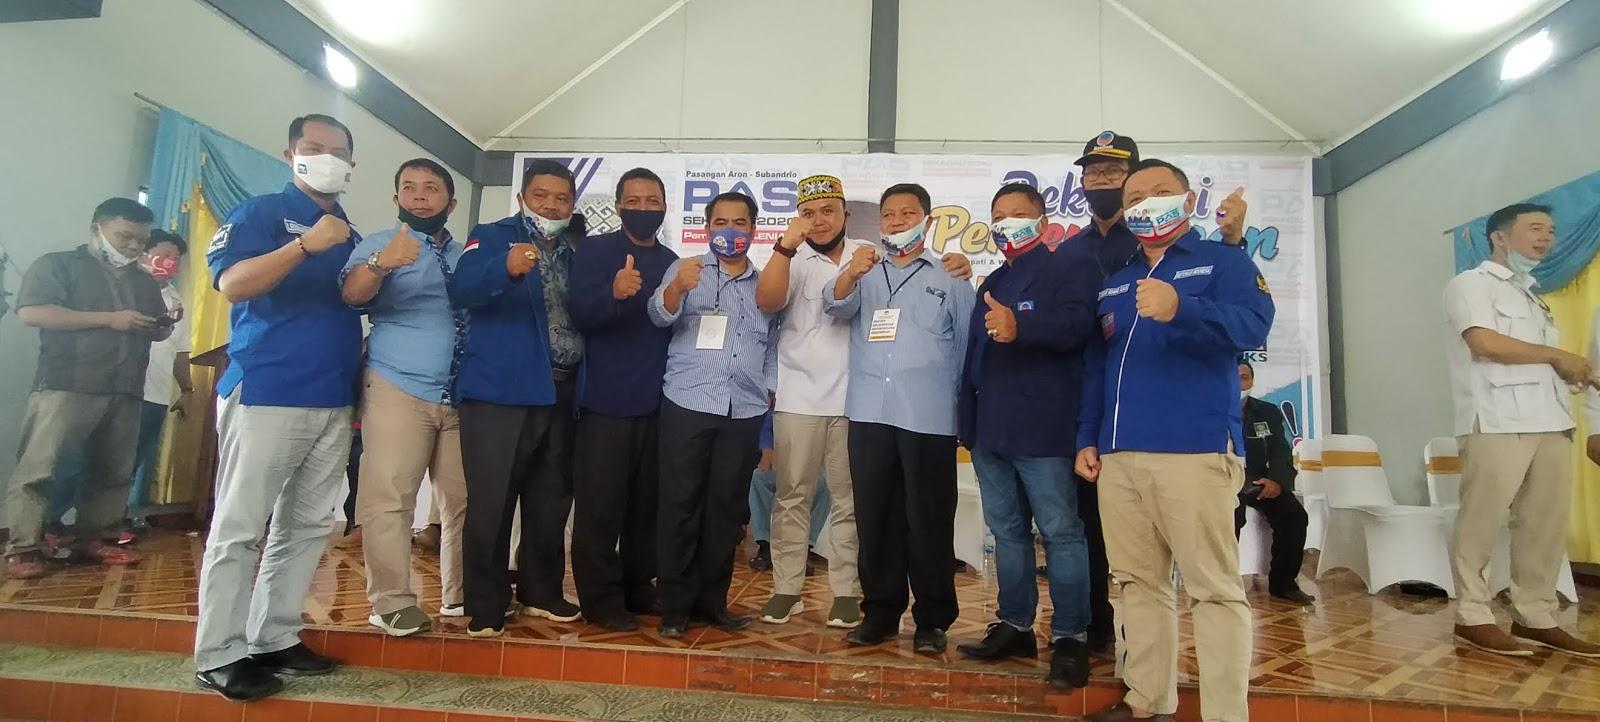 Mewakili DPW Partai Nasdem Fransiskus Suwondo Sampaikan Orasi Politik Saat Deklarasi Aron-Subandrio di Sekadau